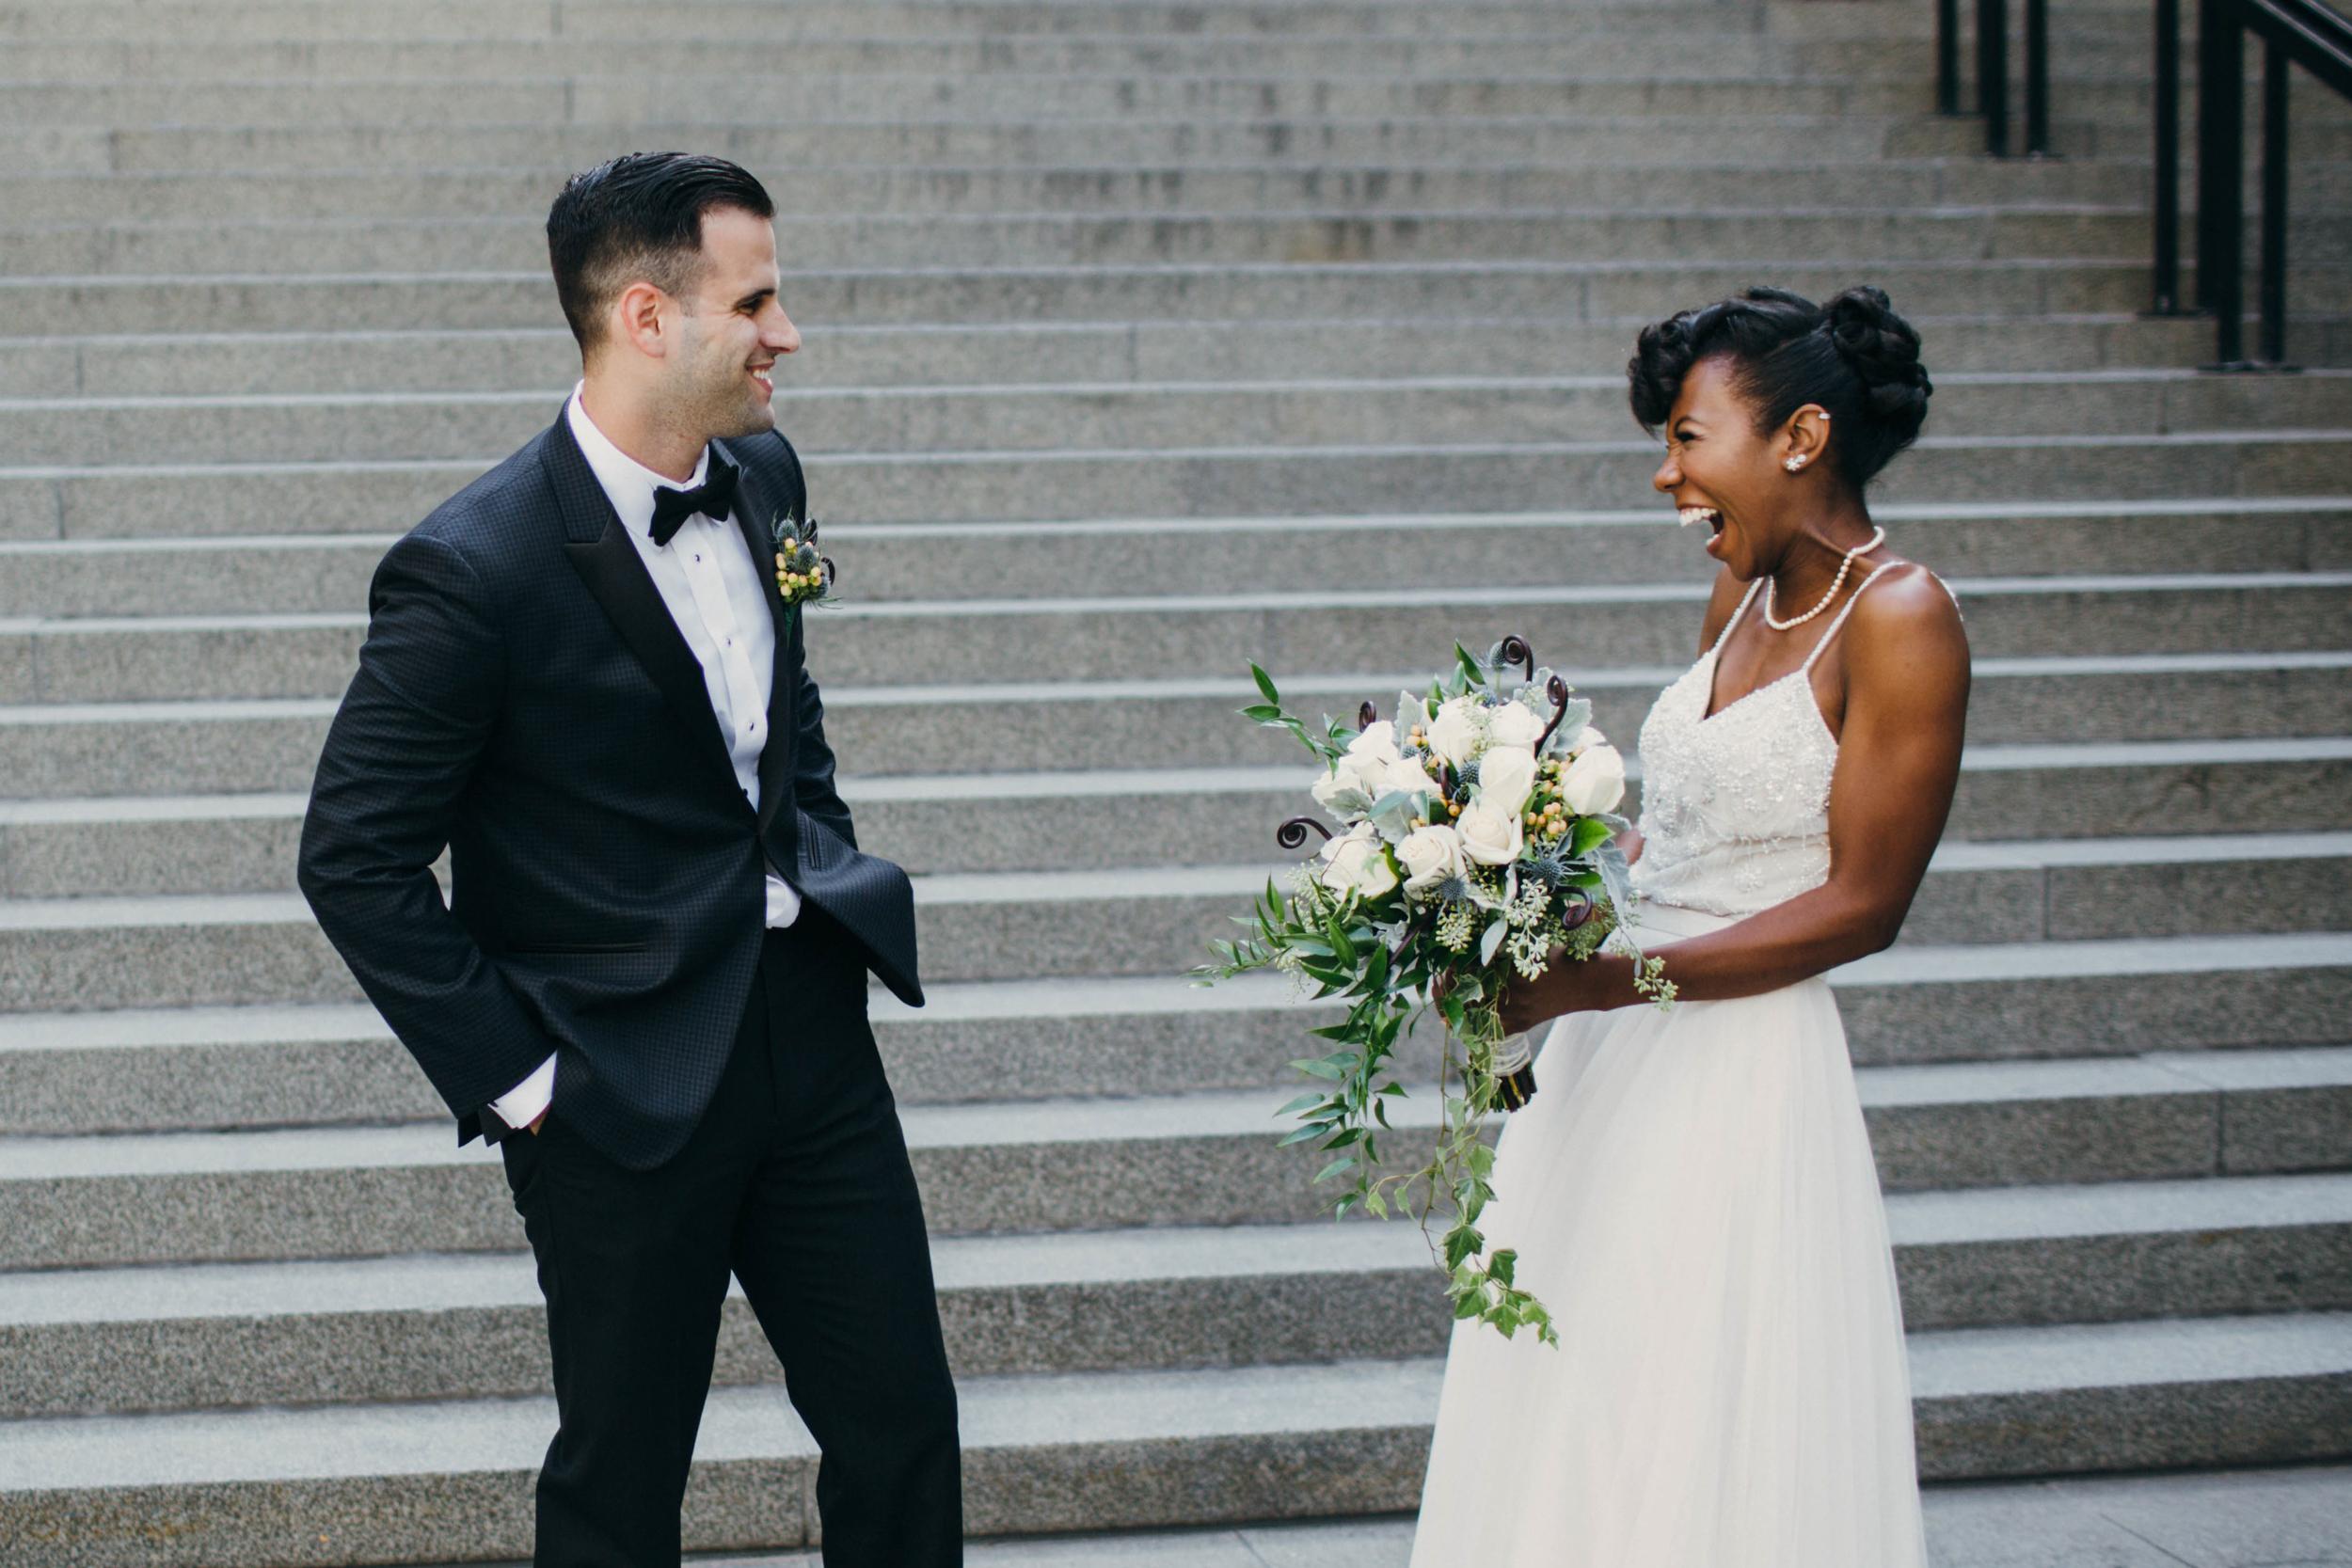 chicago.wedding.urban.intimate.zed451.lake.milton olive park-26.jpg